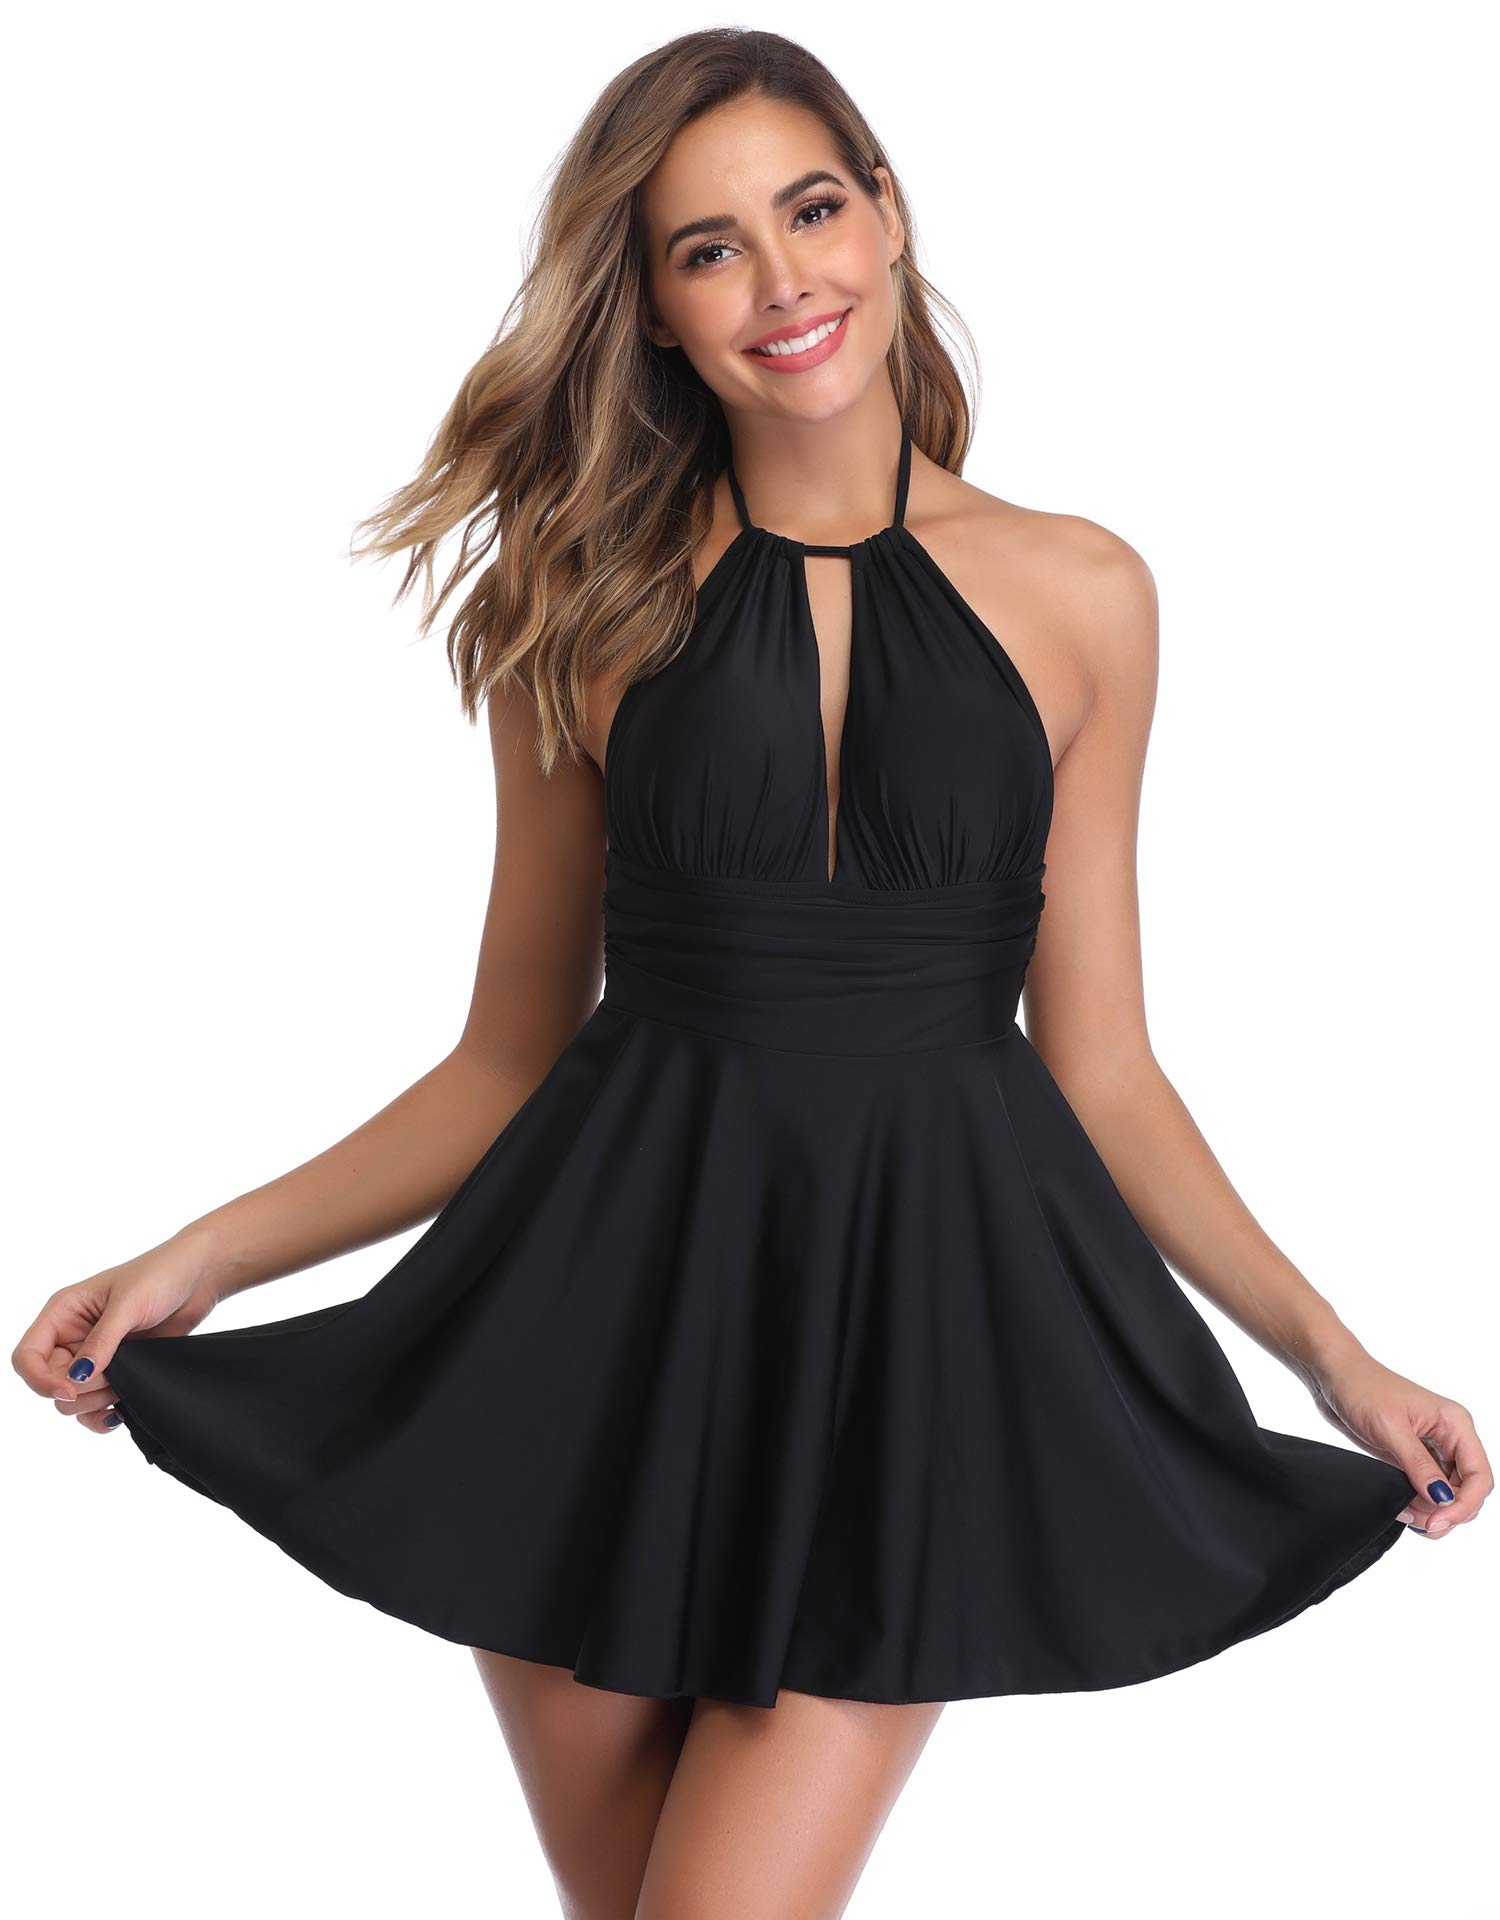 MarinaVida Women One Piece Tummy Control Swimsuit High Waisted Skirtini Cover Up Swimdress Black